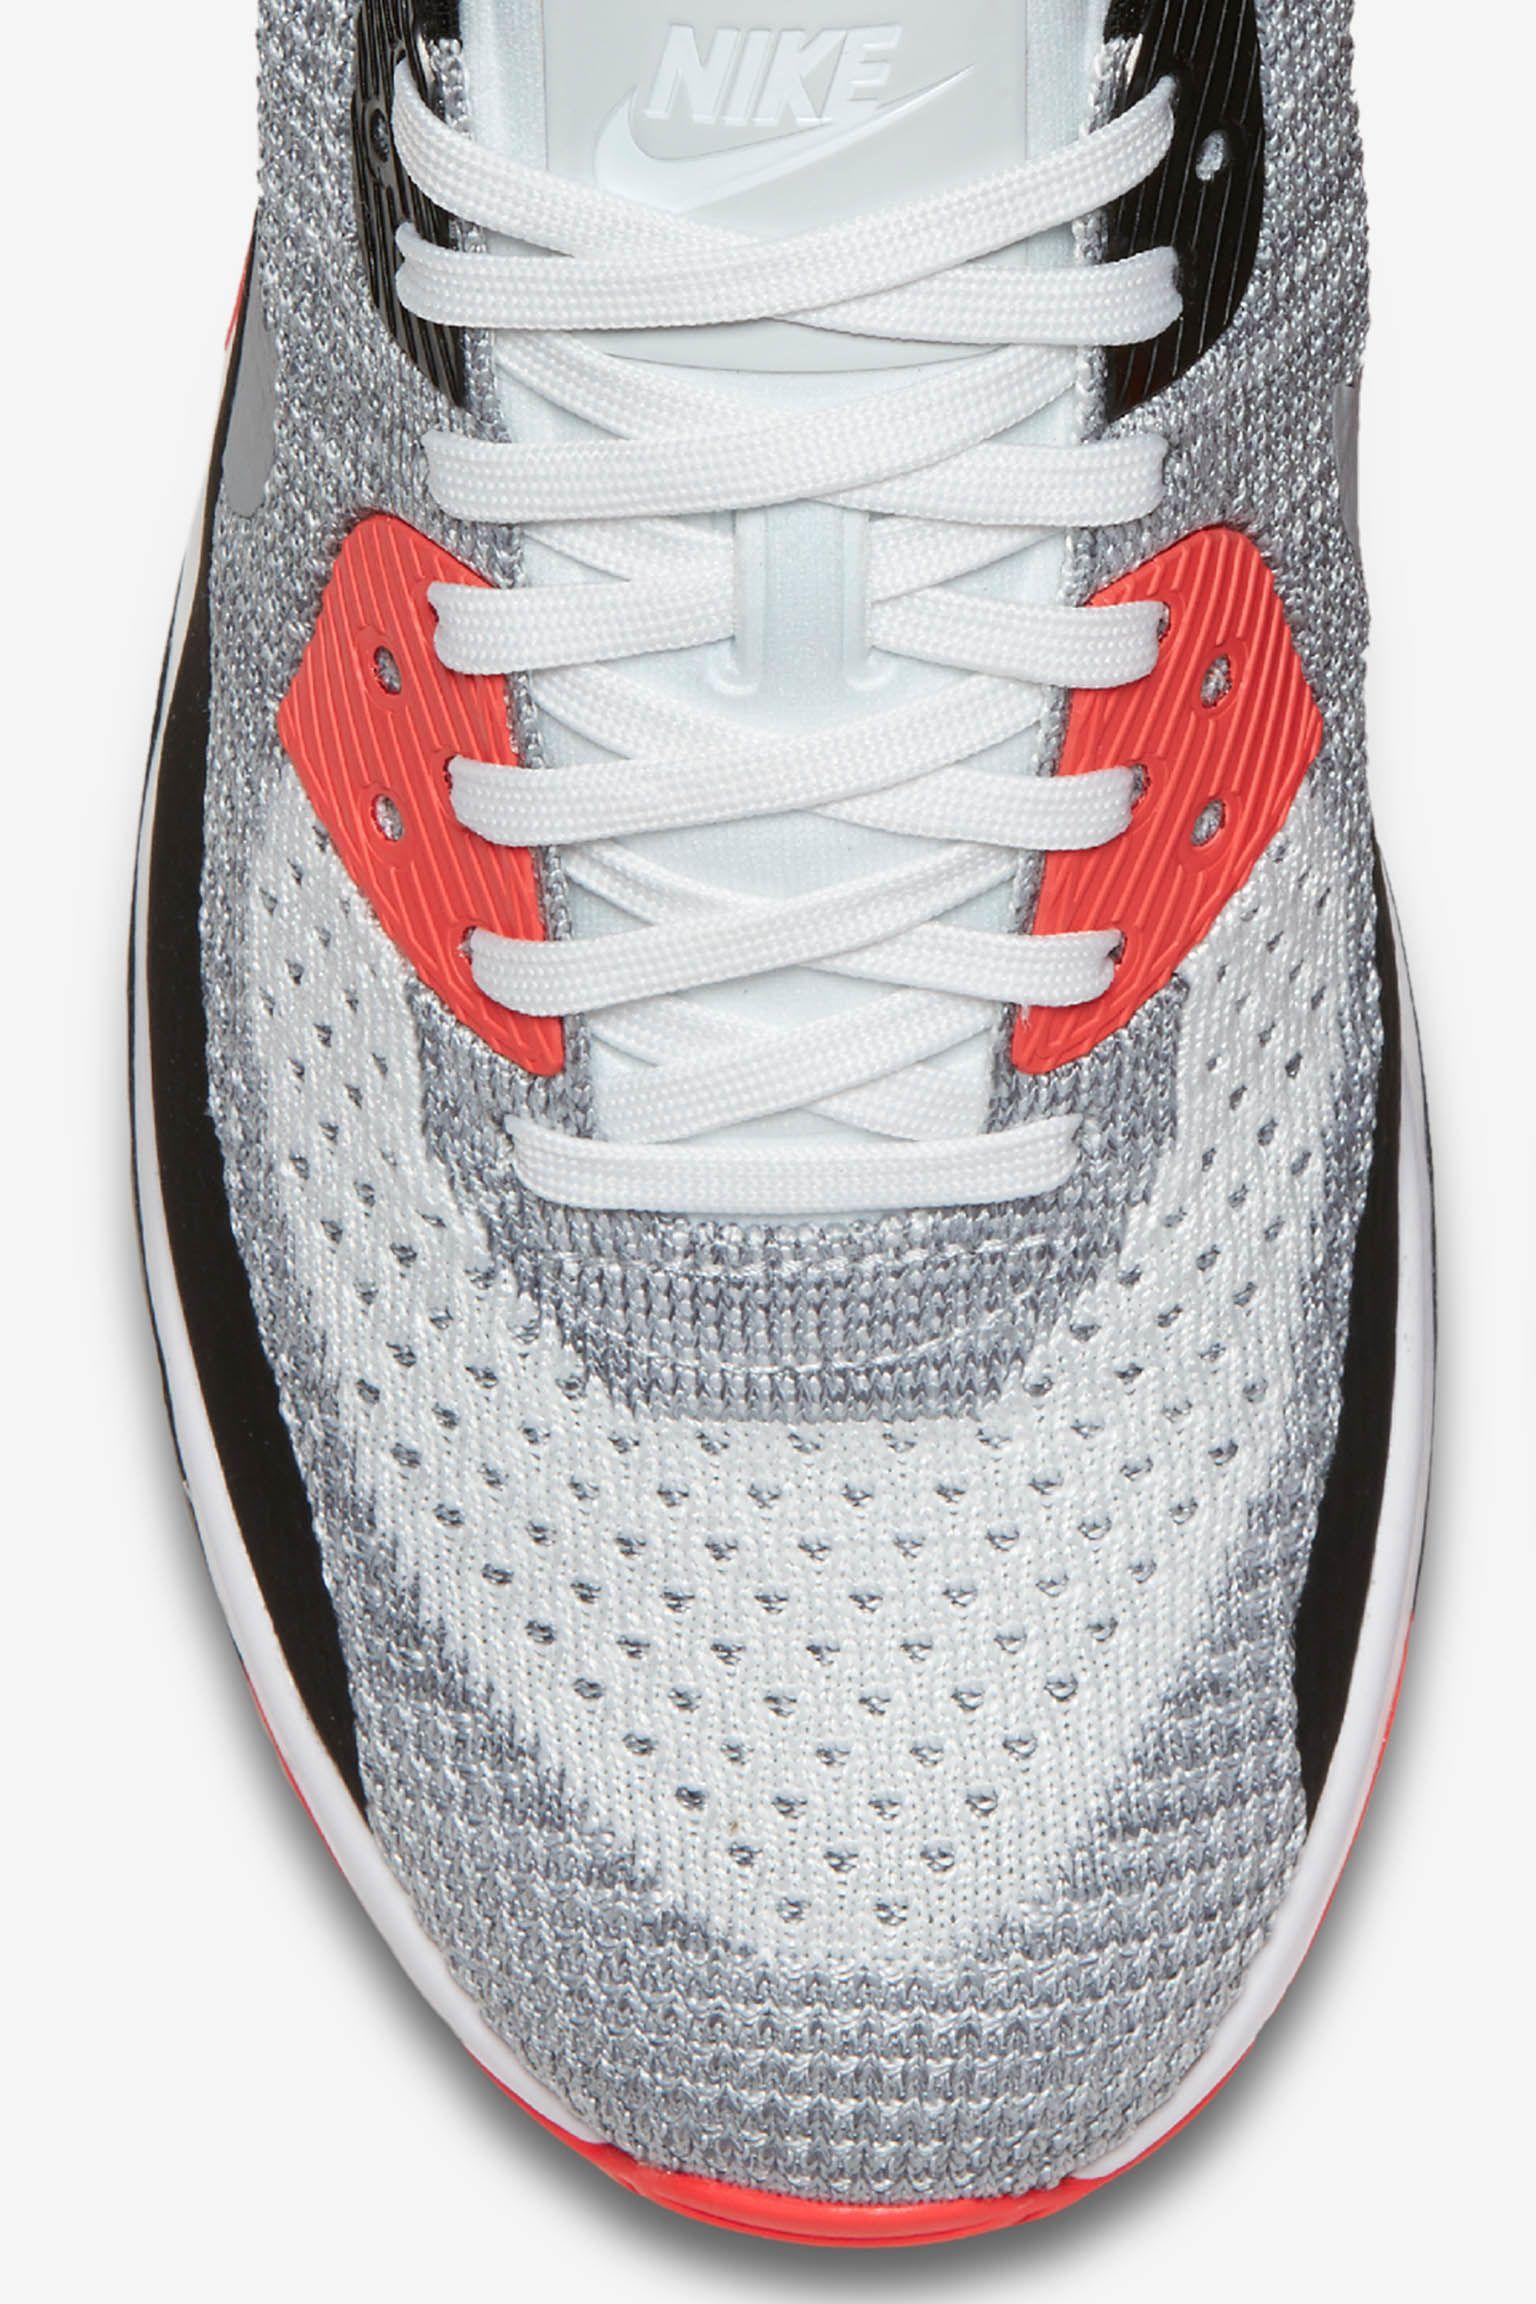 "Buty damskie Nike Air Max 90 Ultra 2.0 Flyknit ""White & Bright Crimson"""